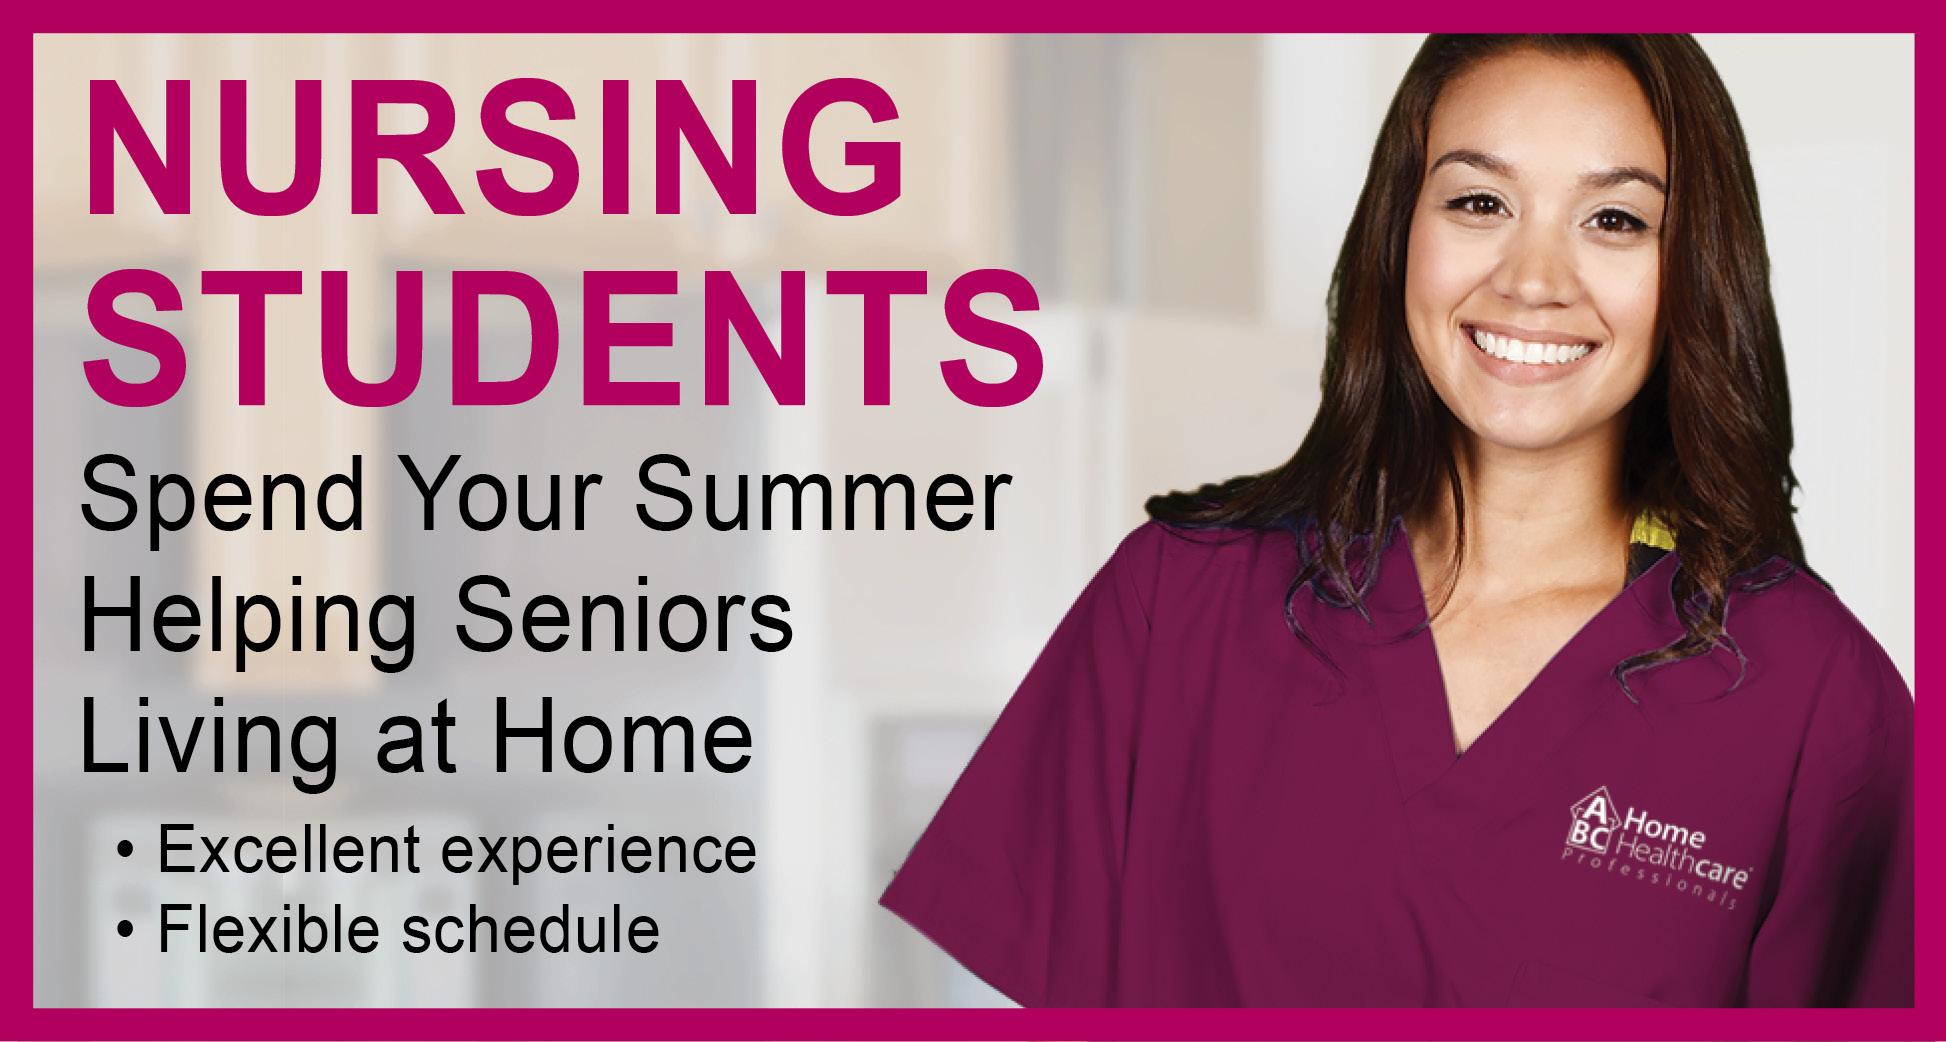 Nursing Students_HIRING_FACEBOOKAD